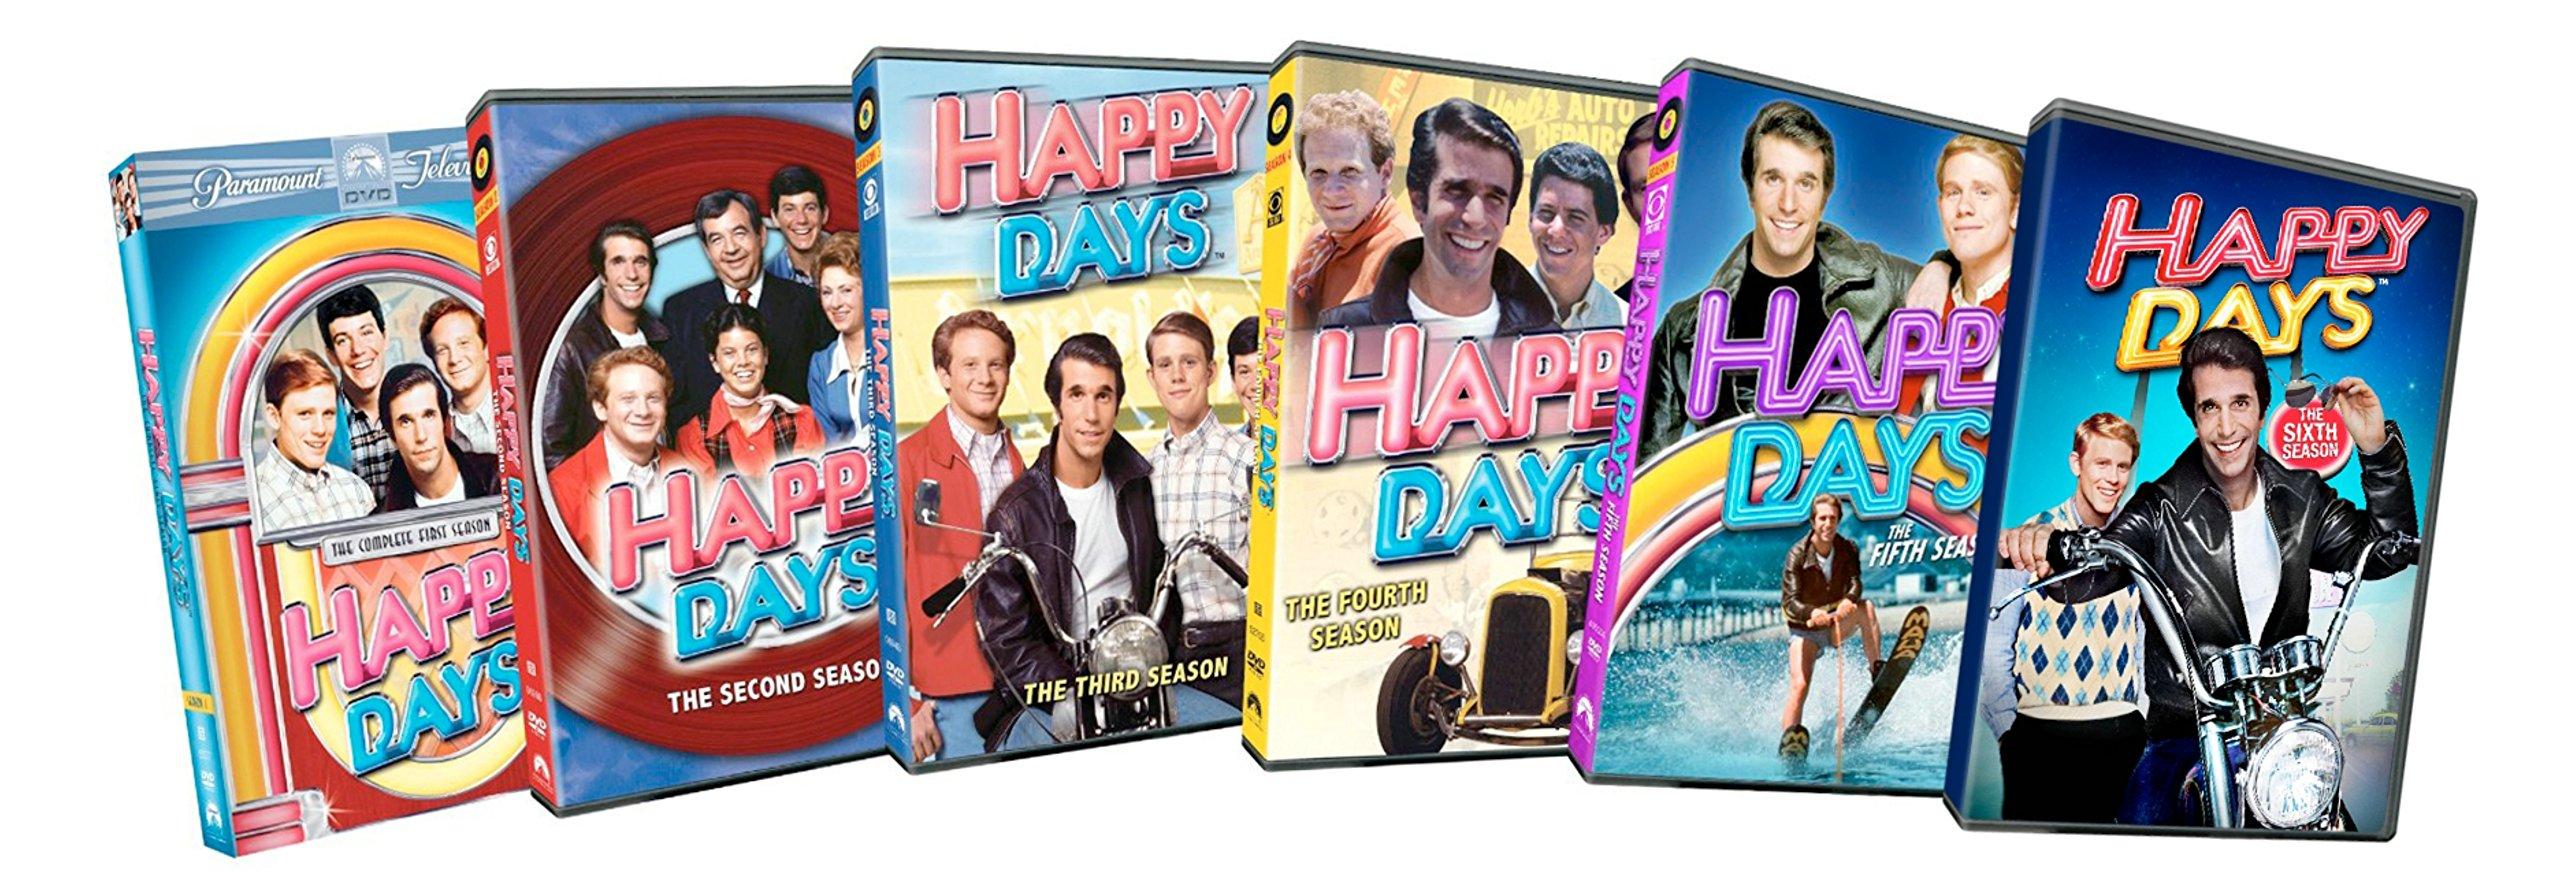 Happy Days: Six Season Pack